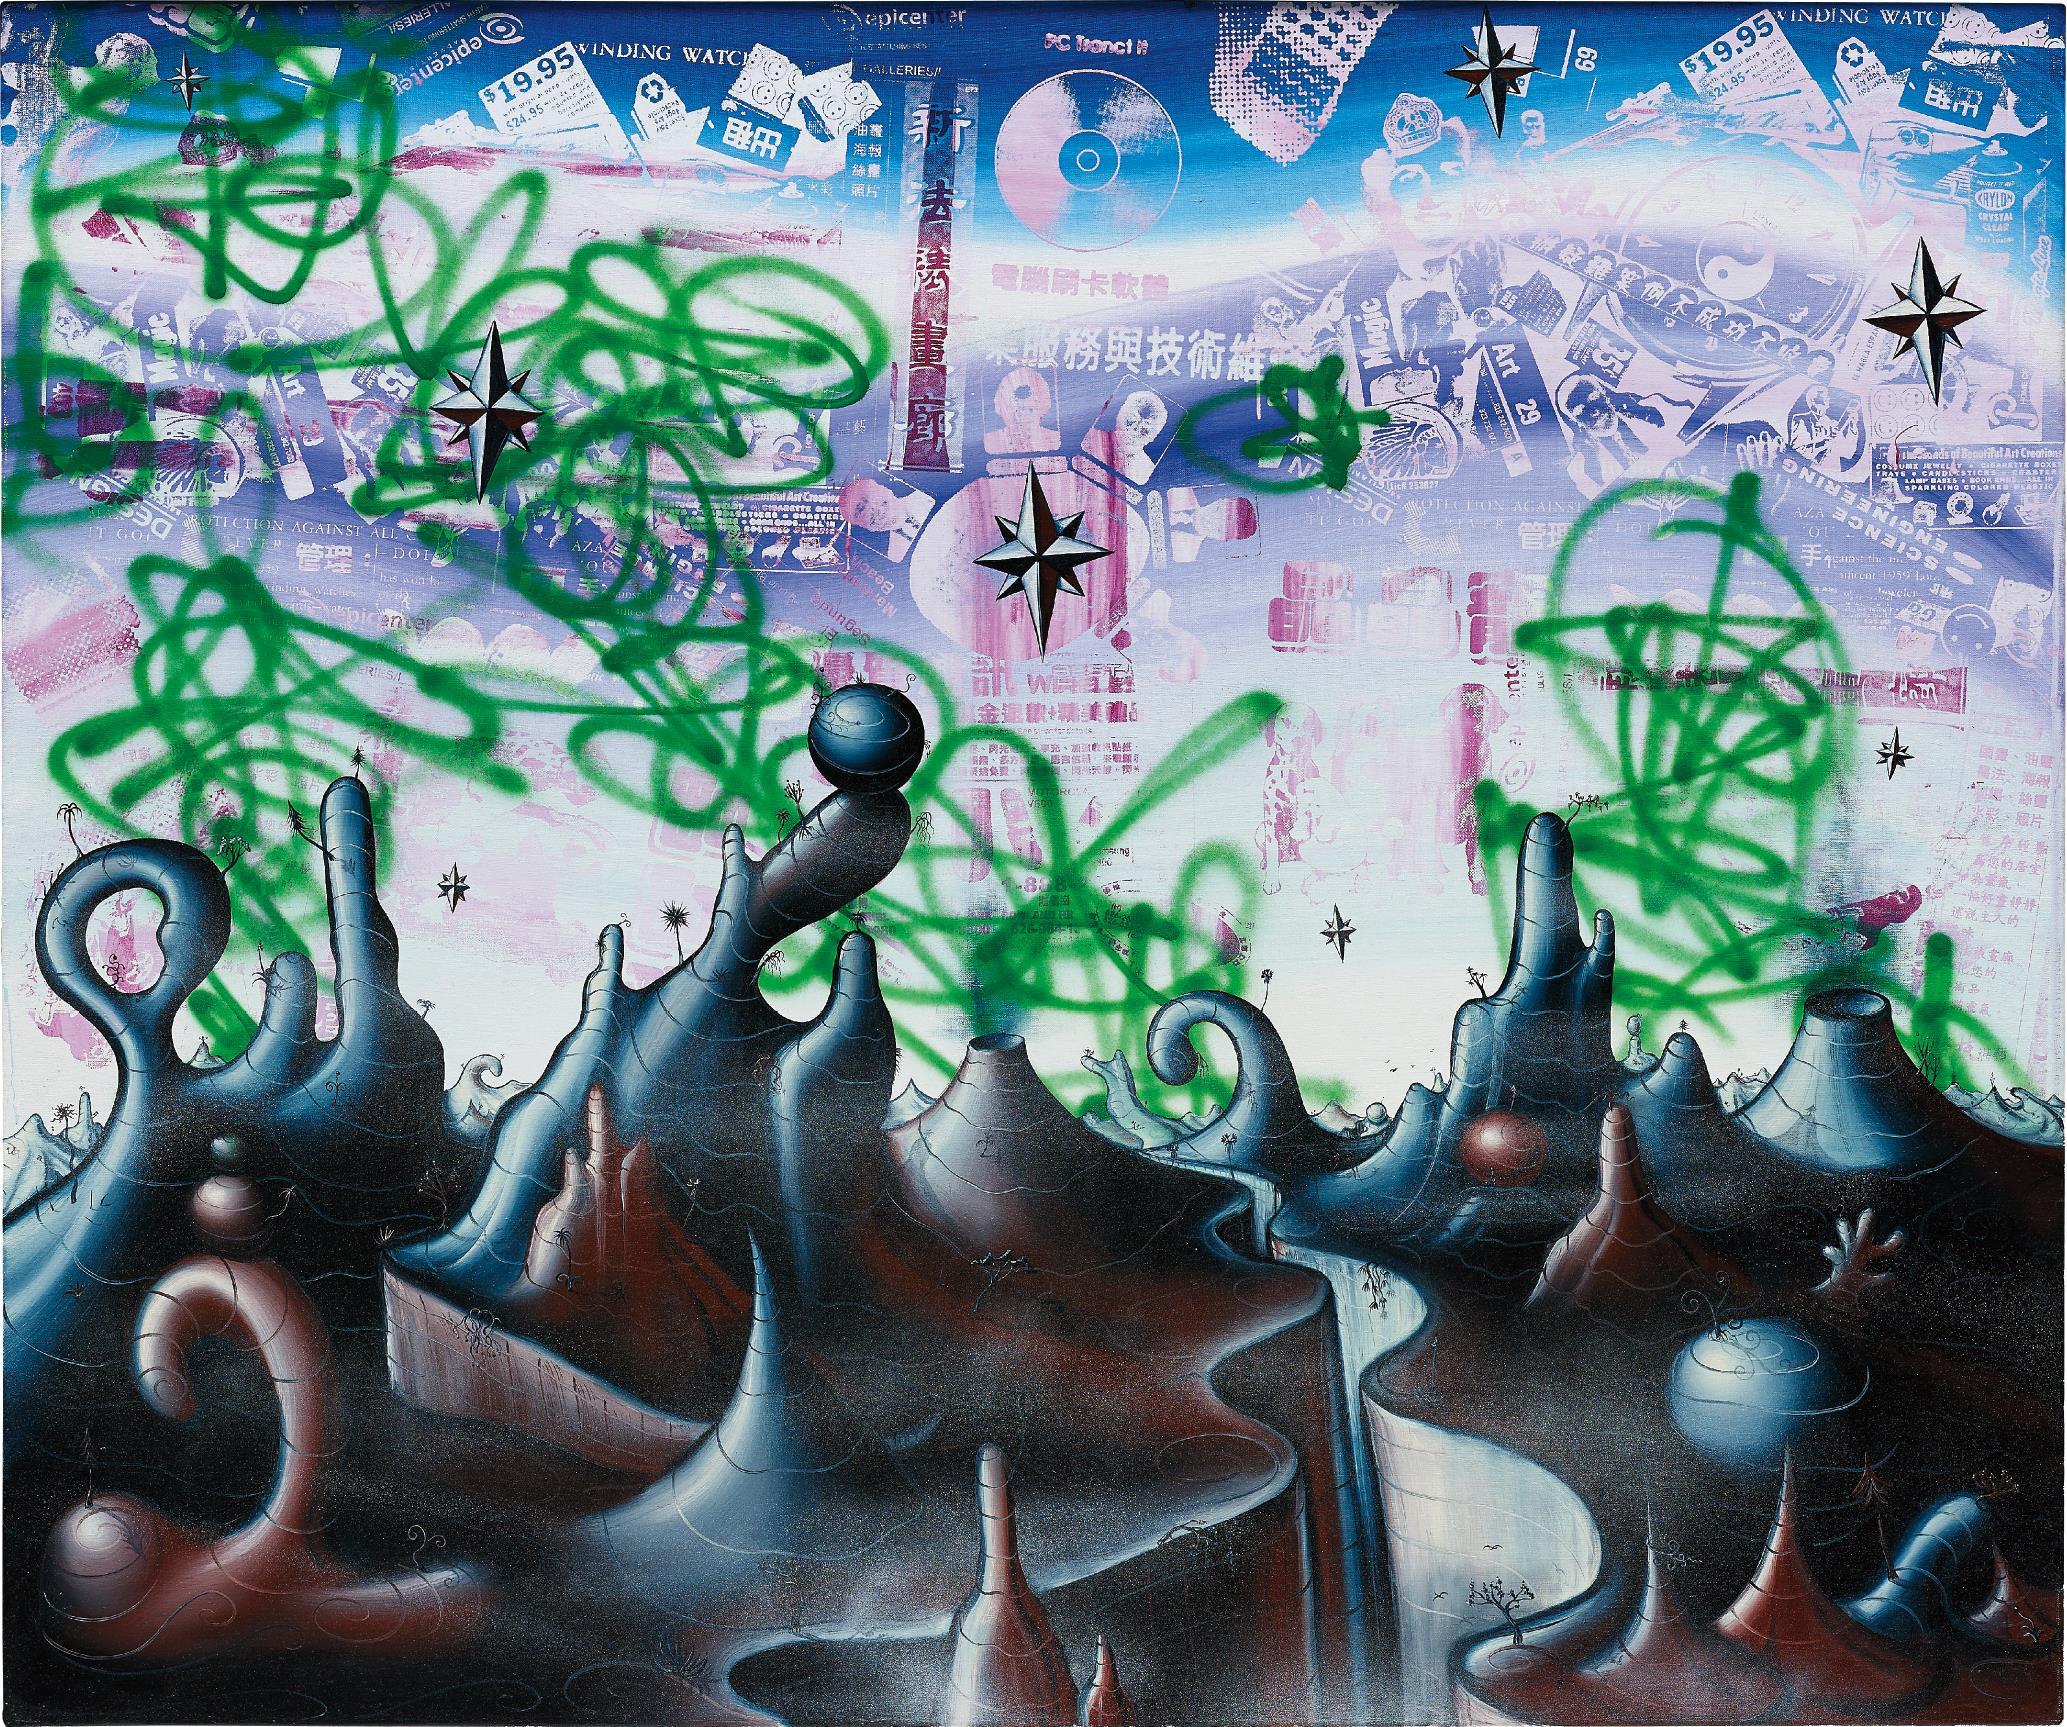 Kenny Scharf-Staticspace-2006